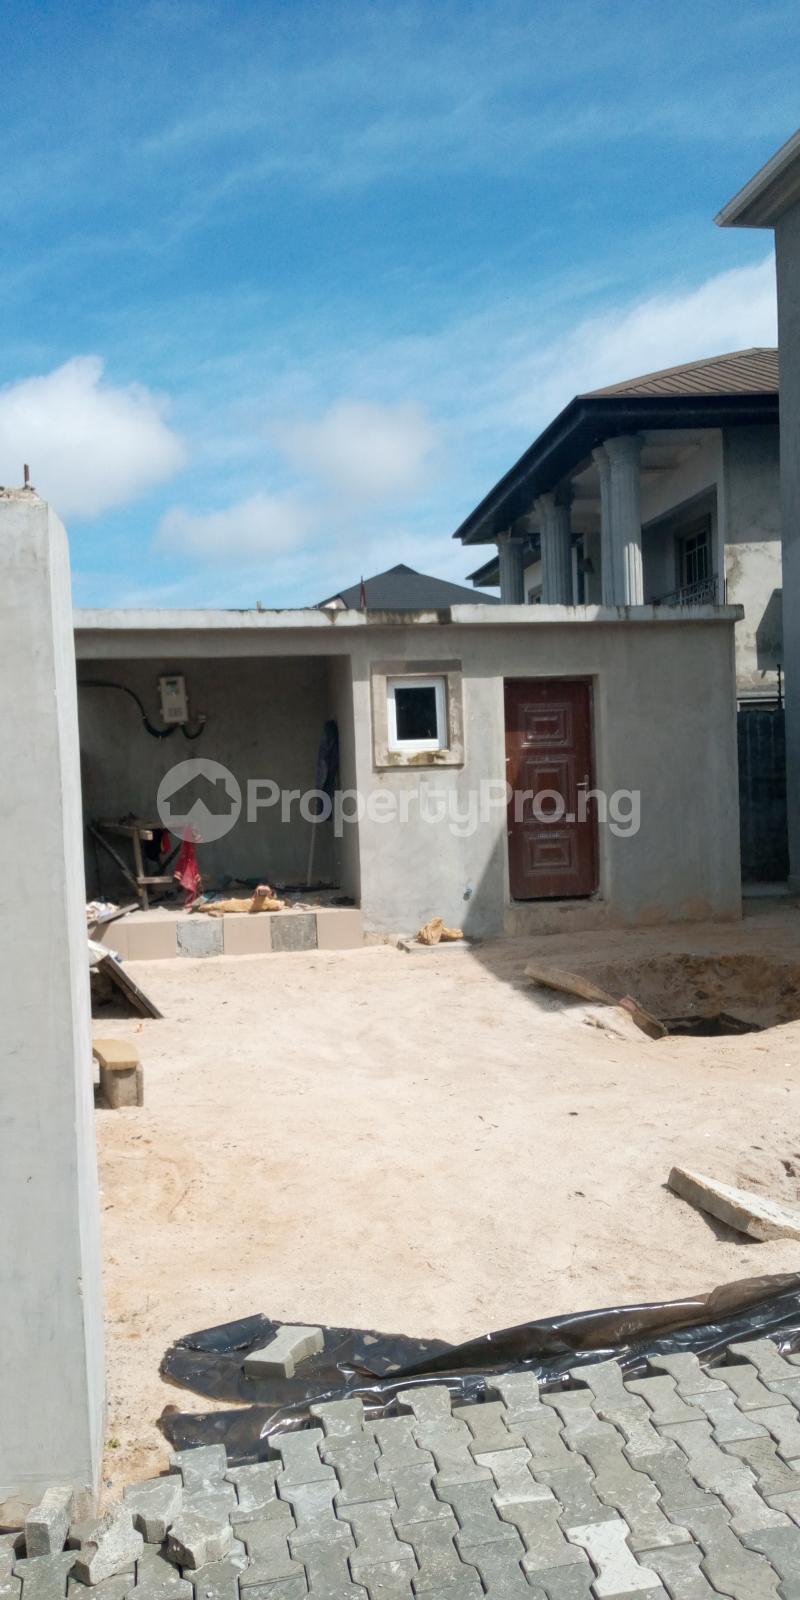 School Commercial Property for sale Eputu Ibeju-Lekki Lagos - 5